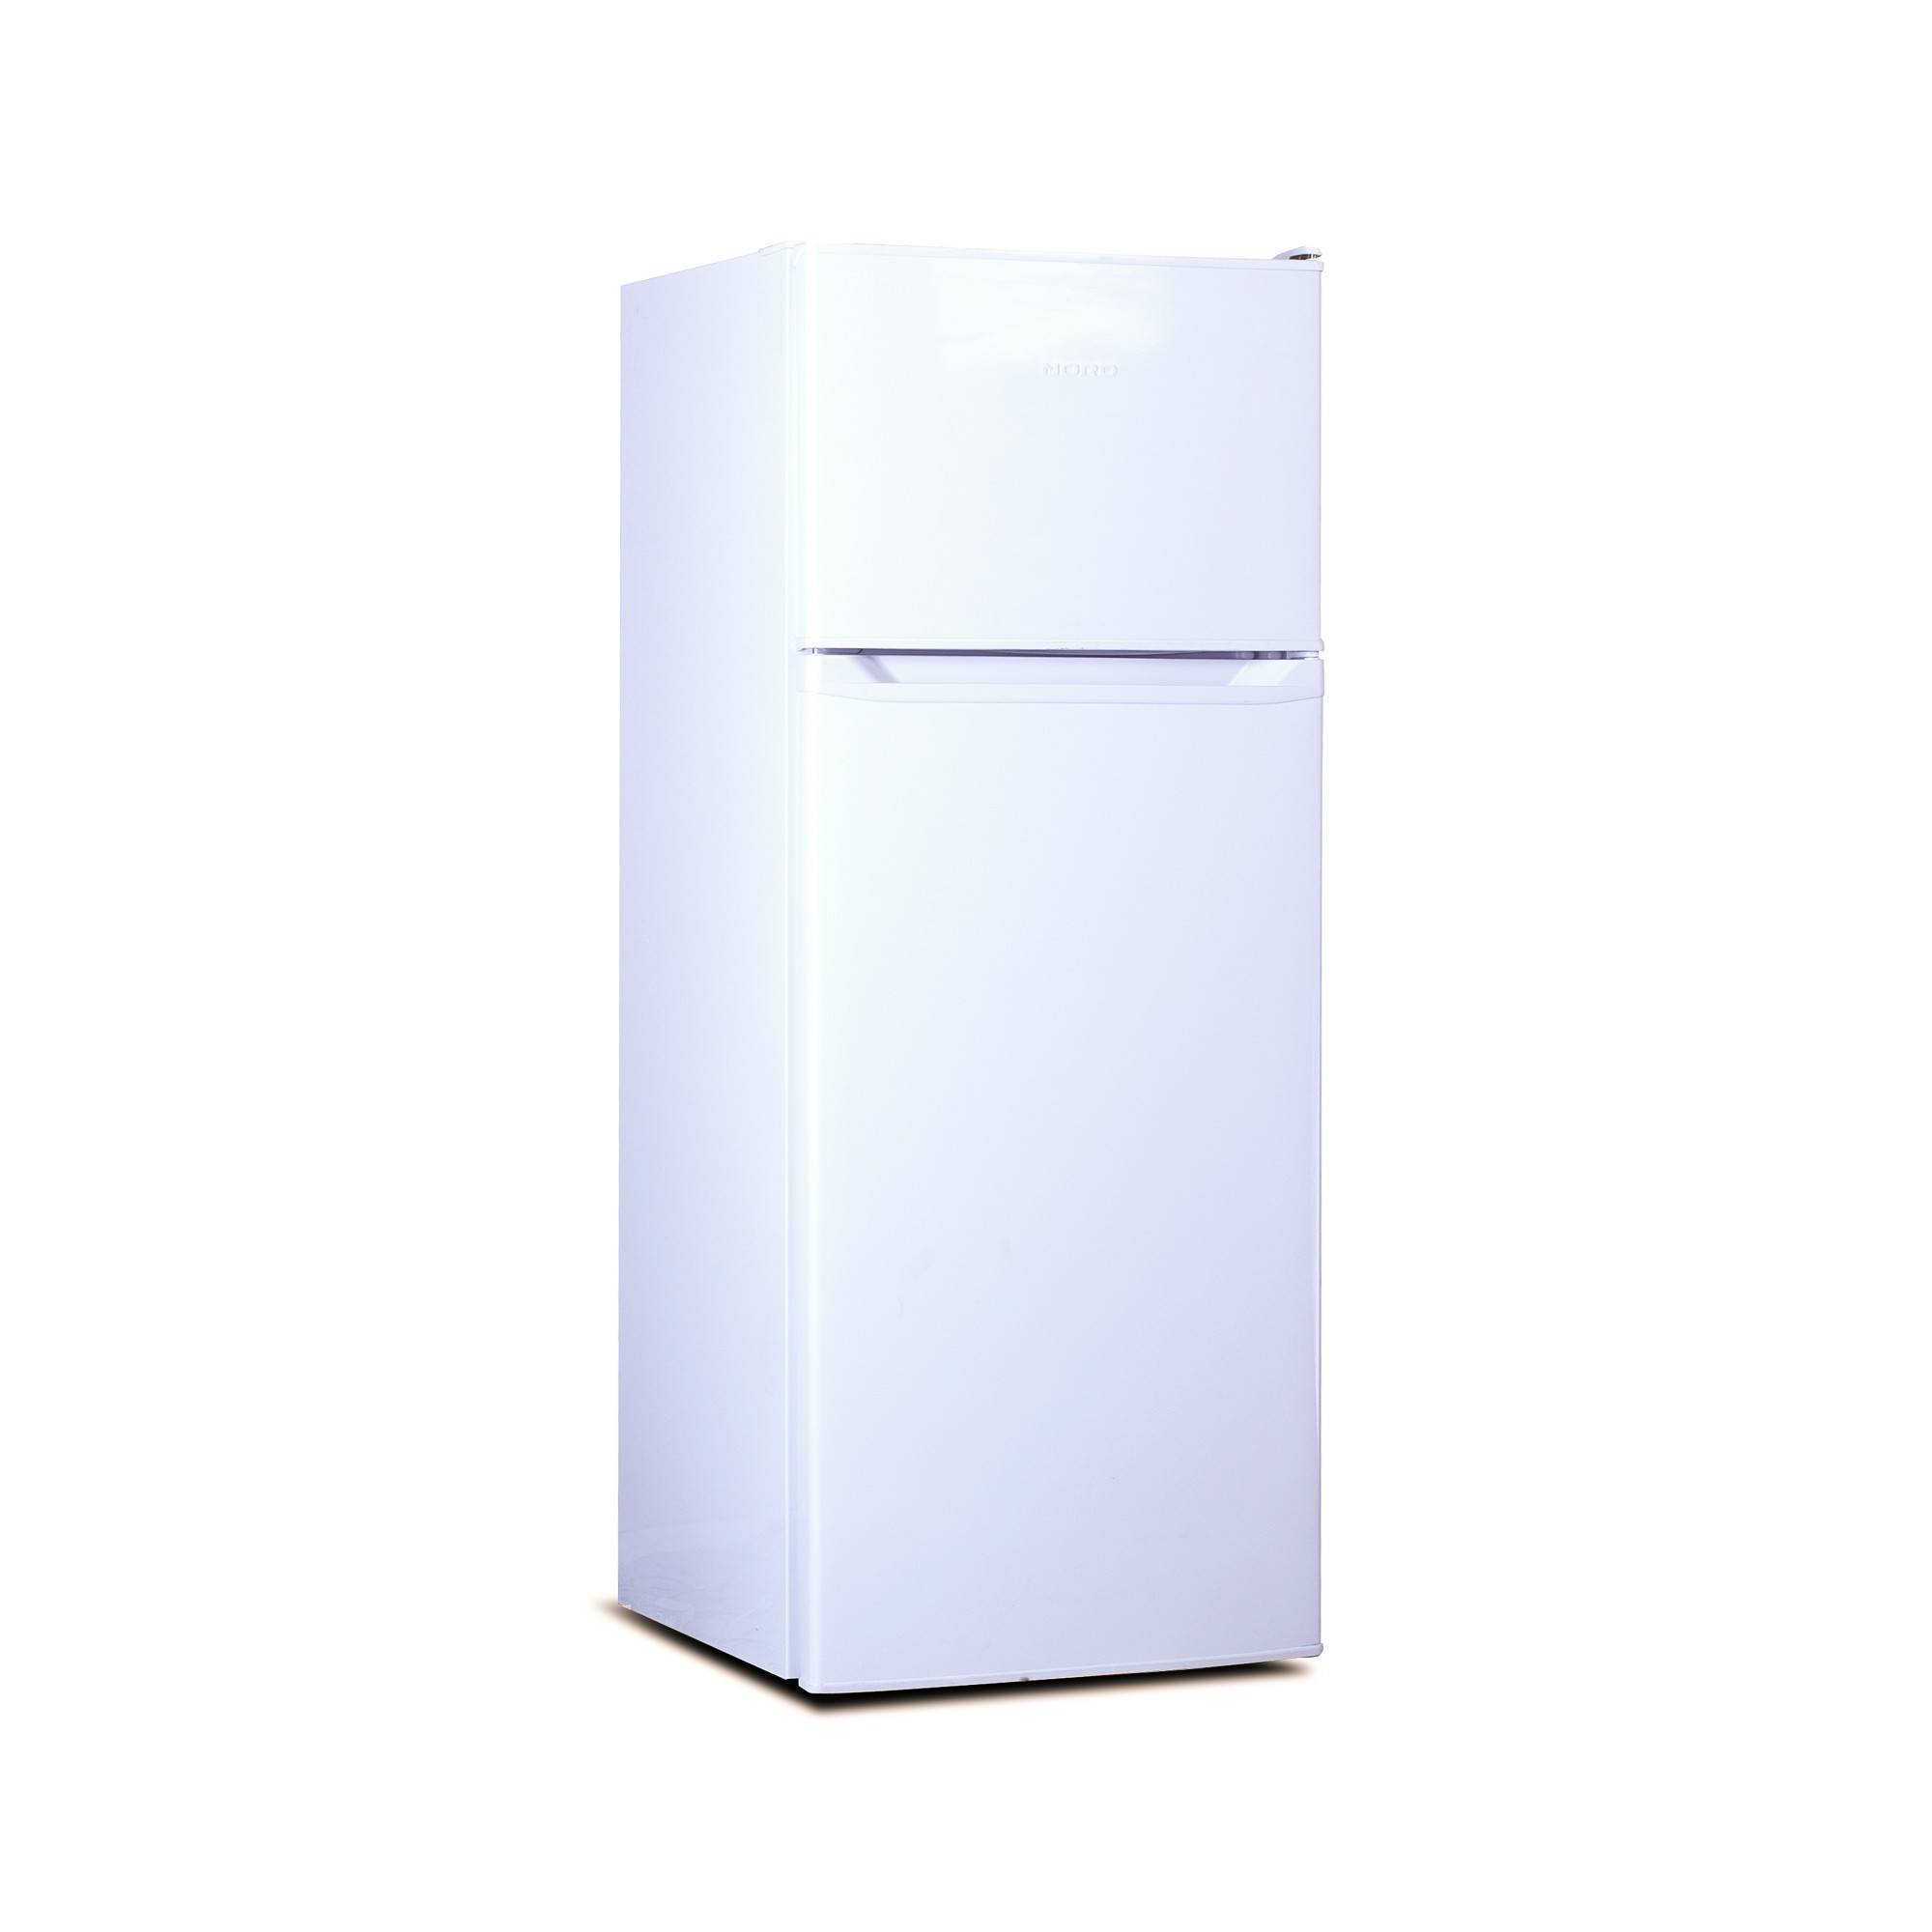 купить холодильник норд